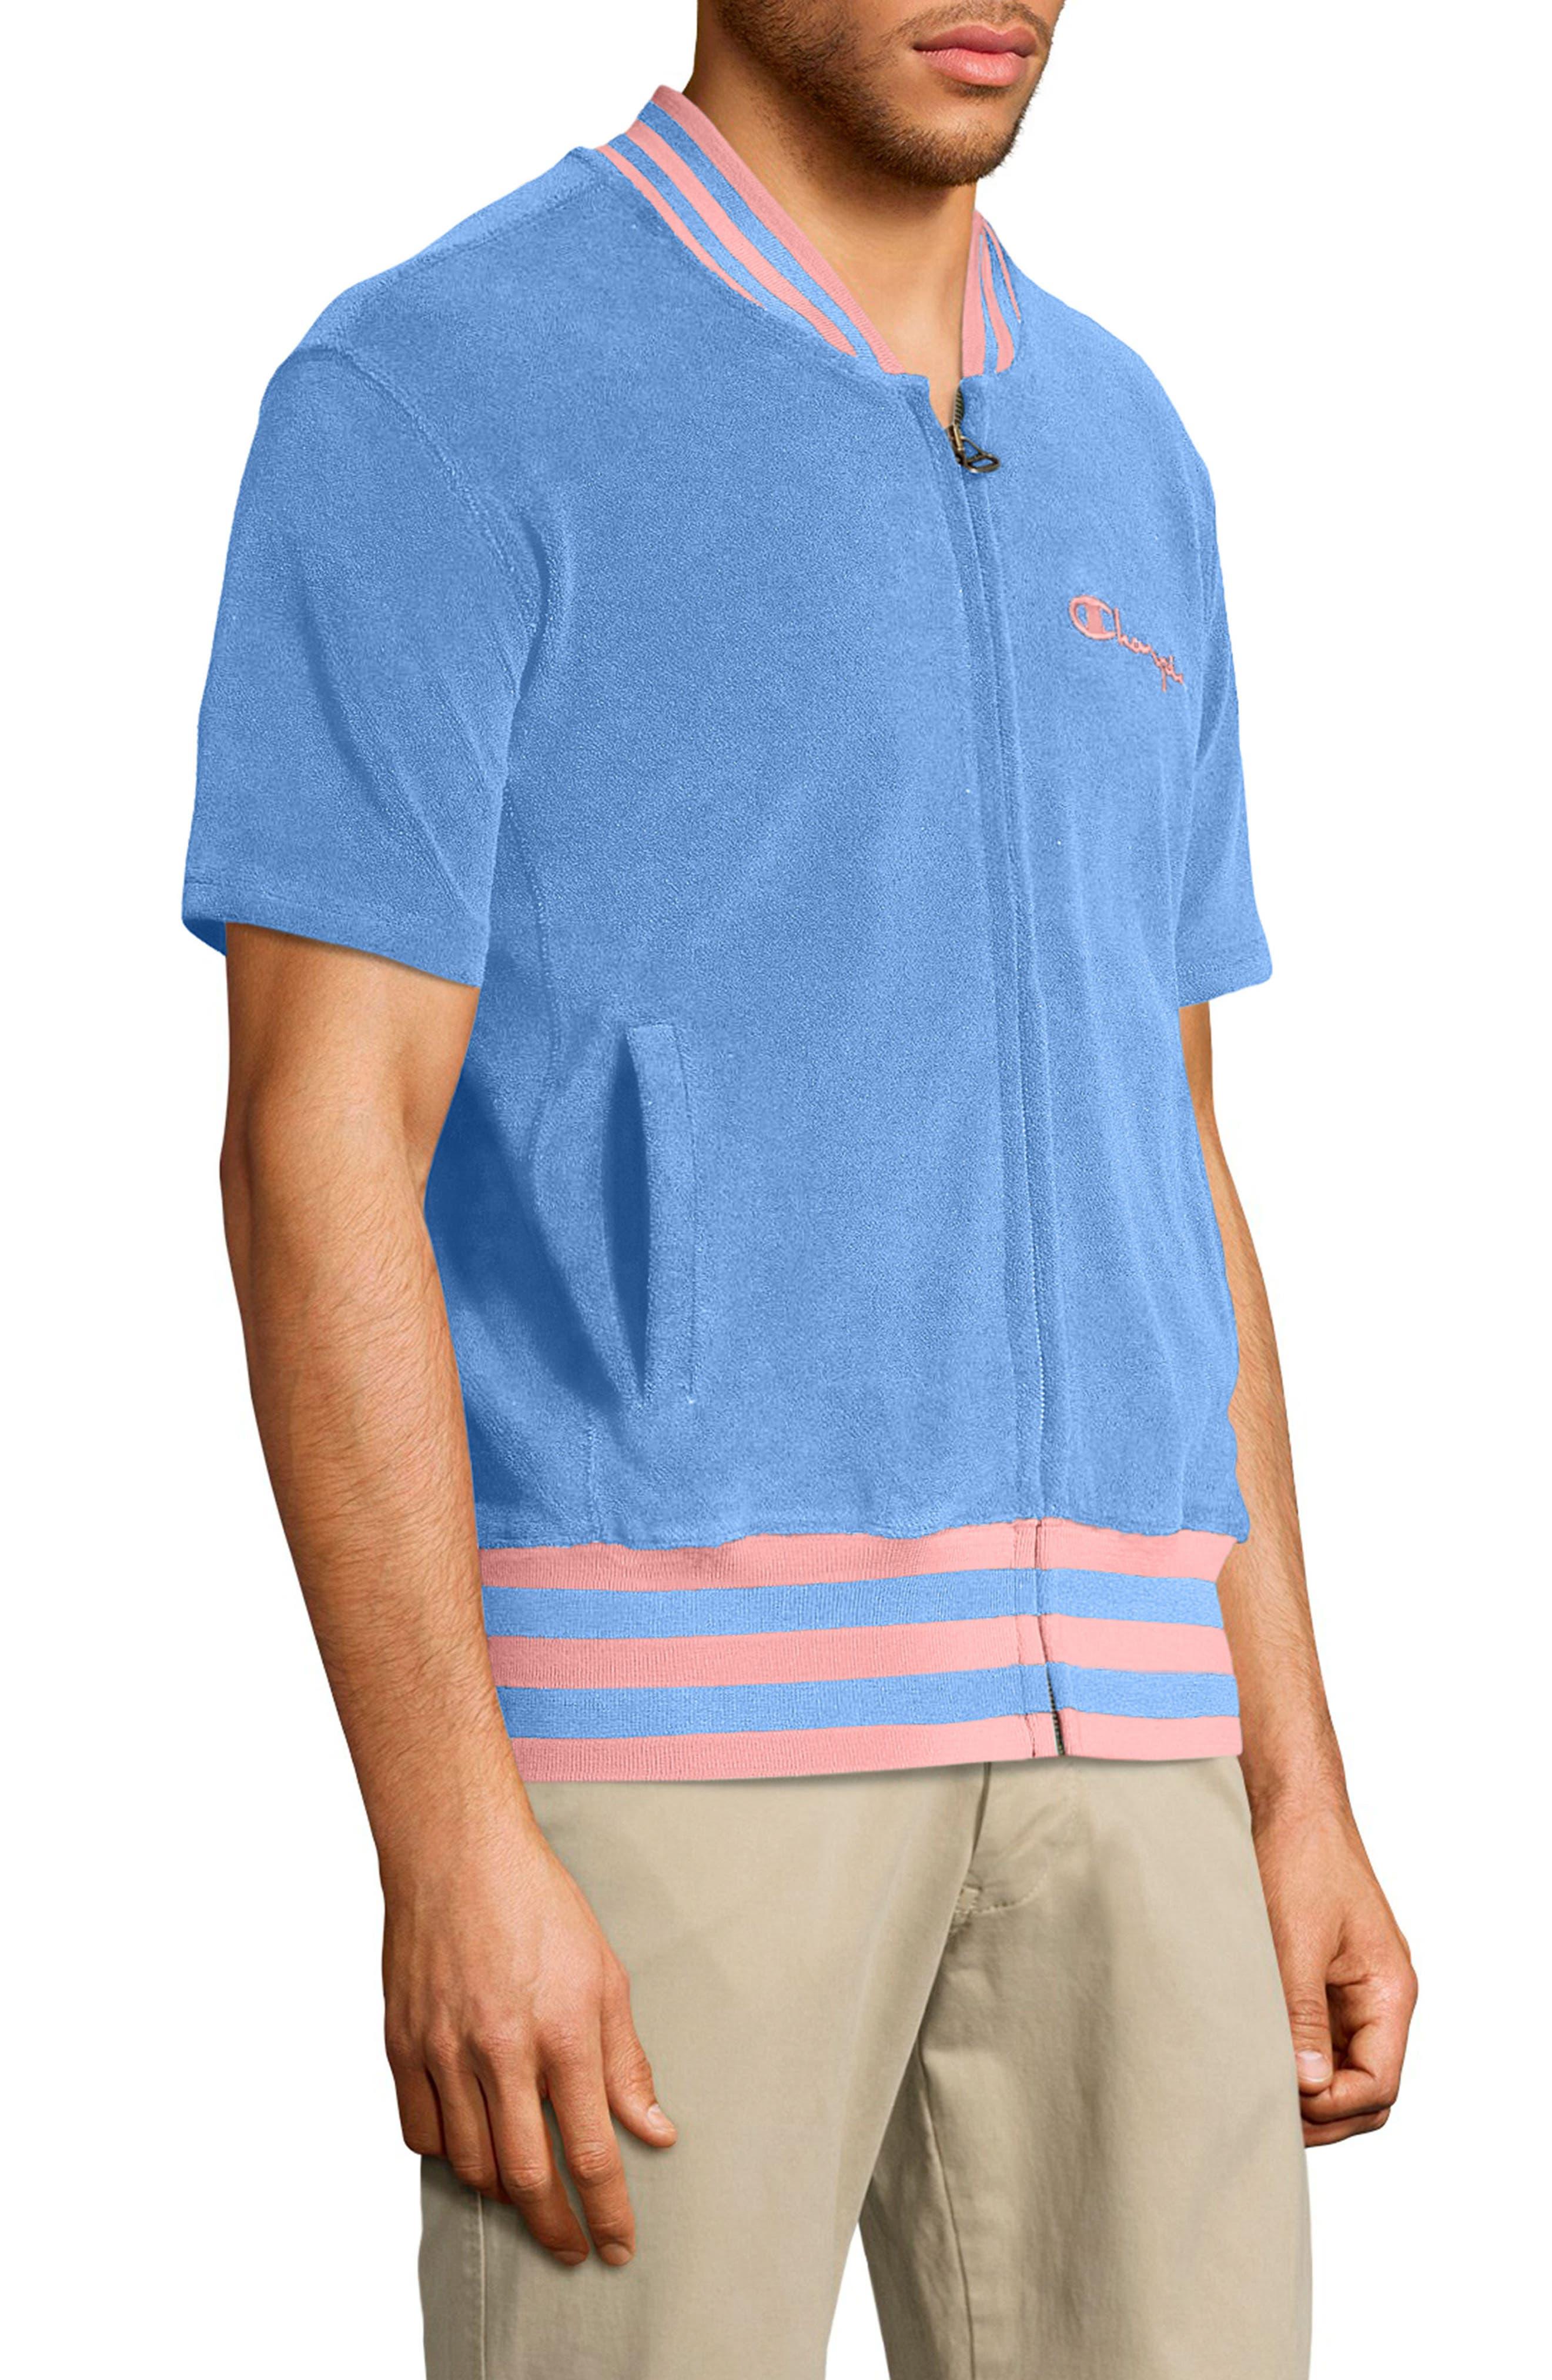 Sponge Terry Stripe Full Zip Sweatshirt,                             Alternate thumbnail 3, color,                             Swiss Blue